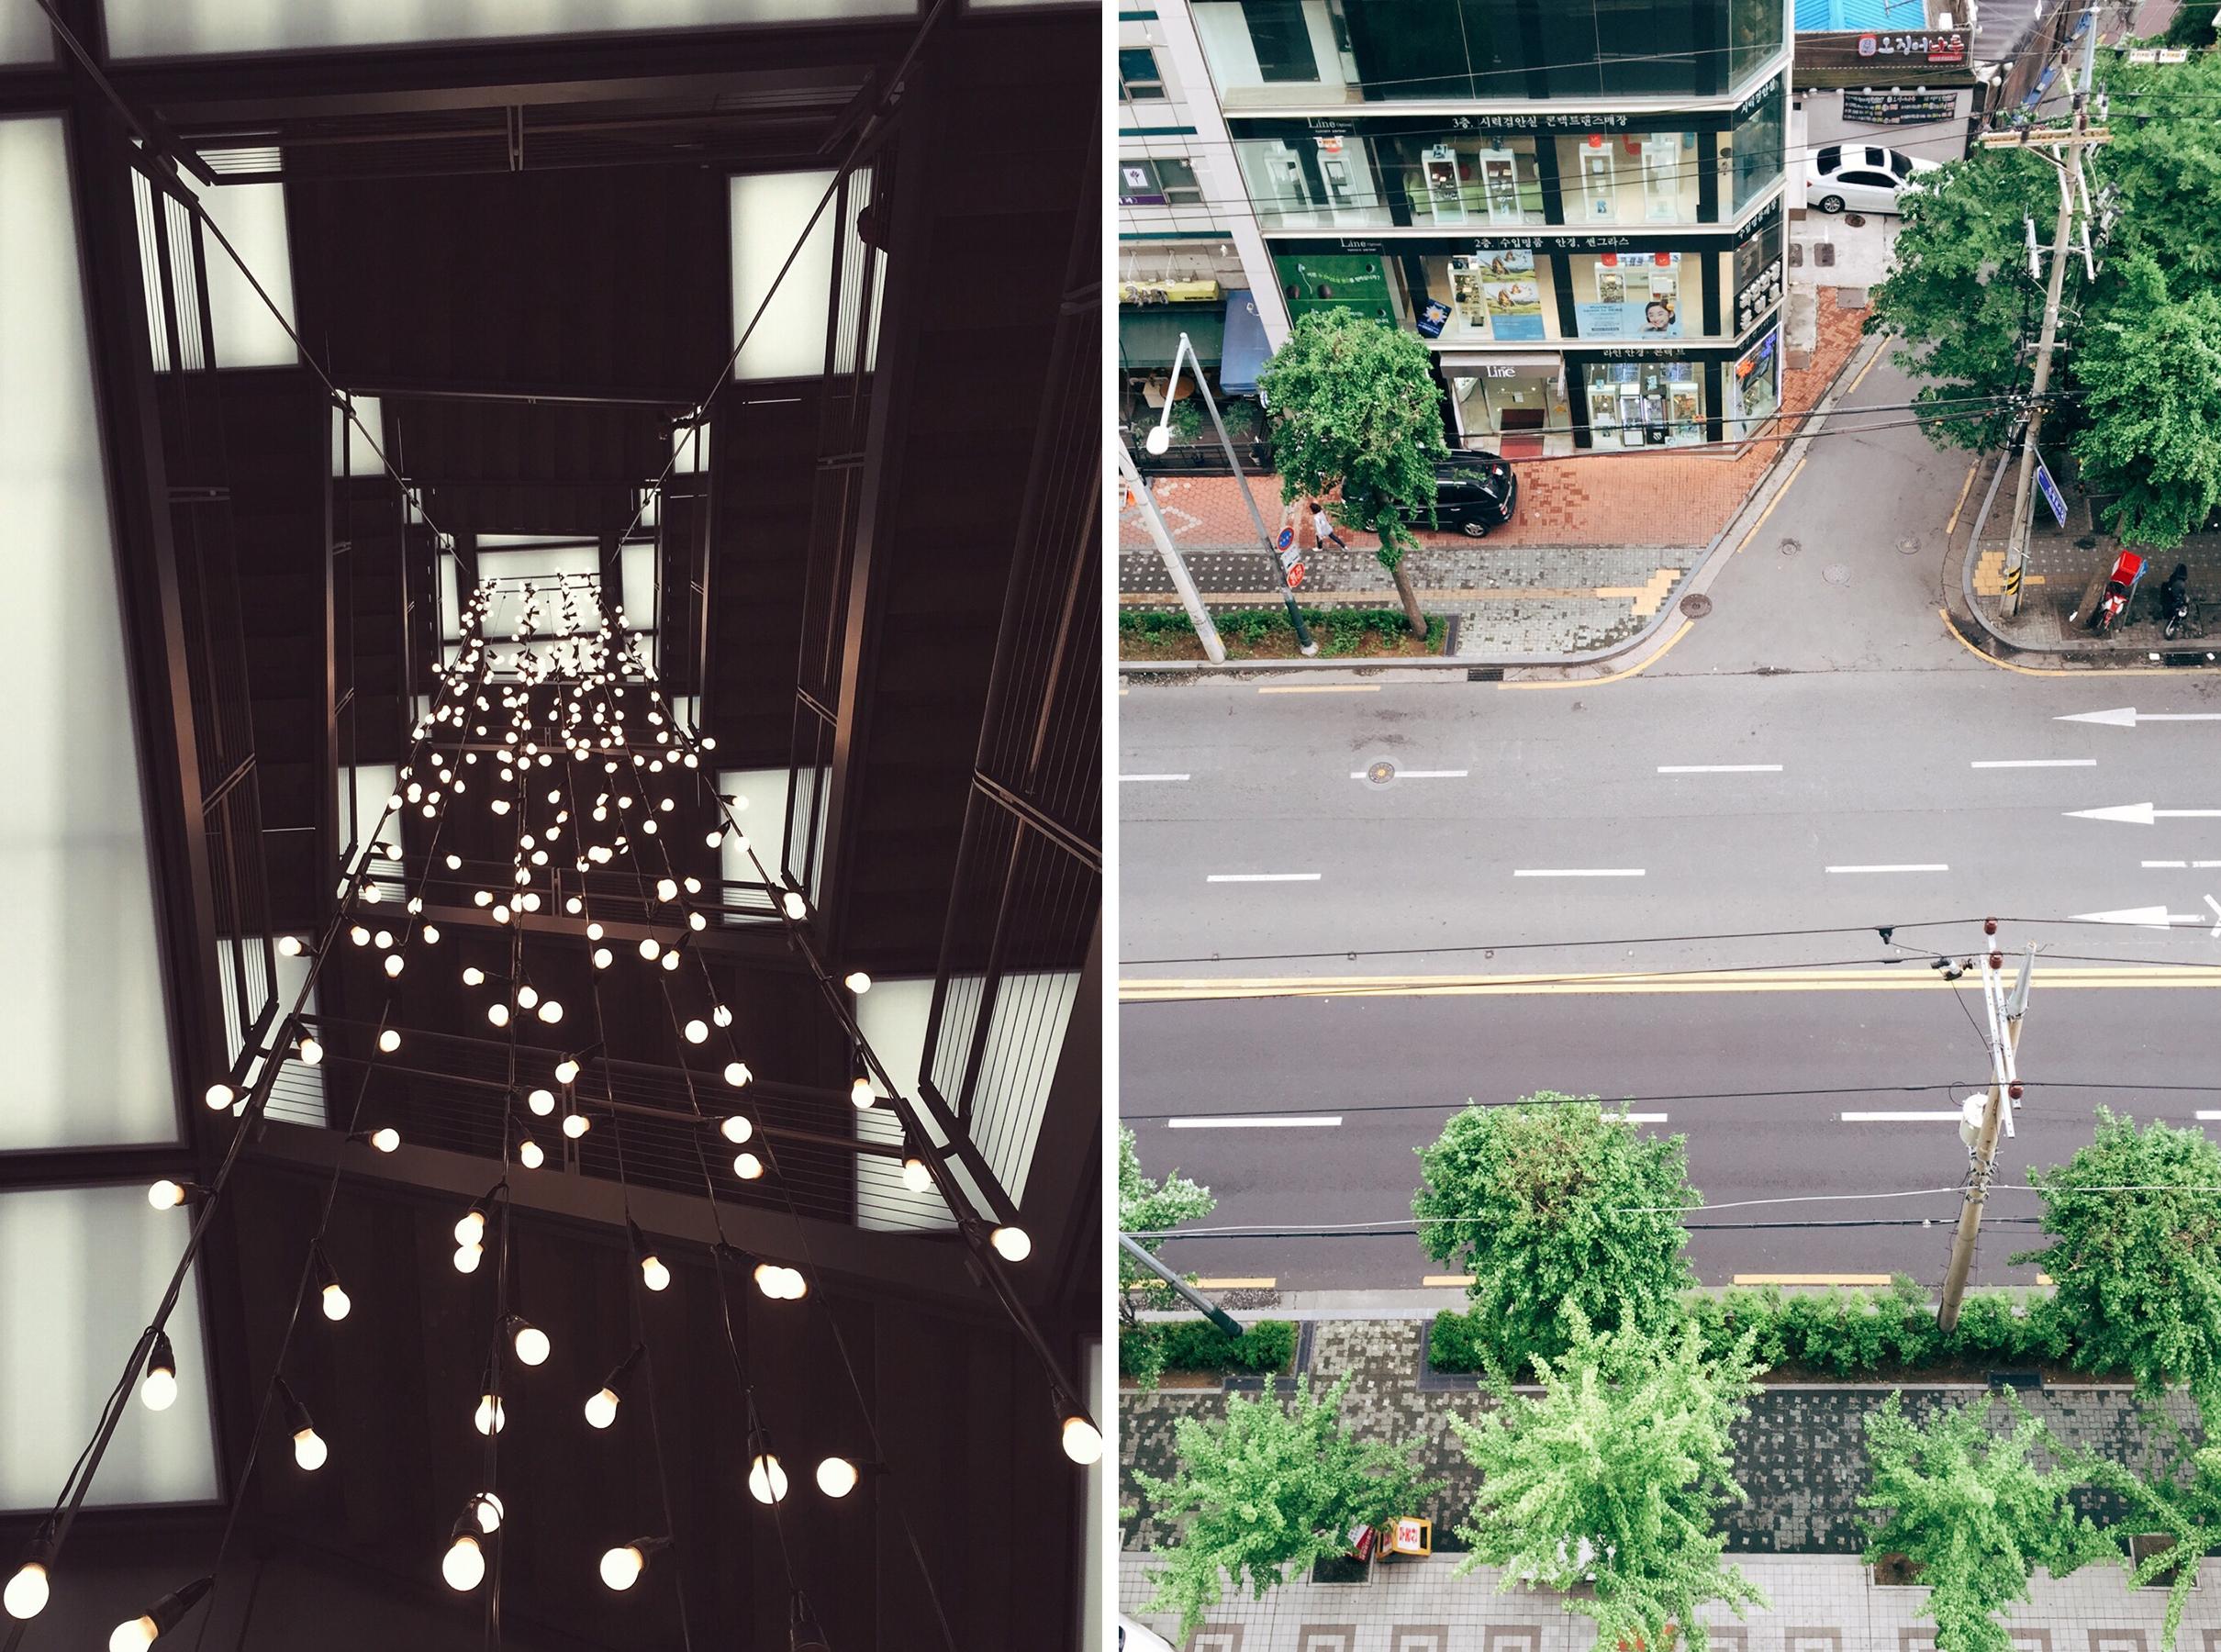 Whitney Museum, New York // Seoul, South Korea